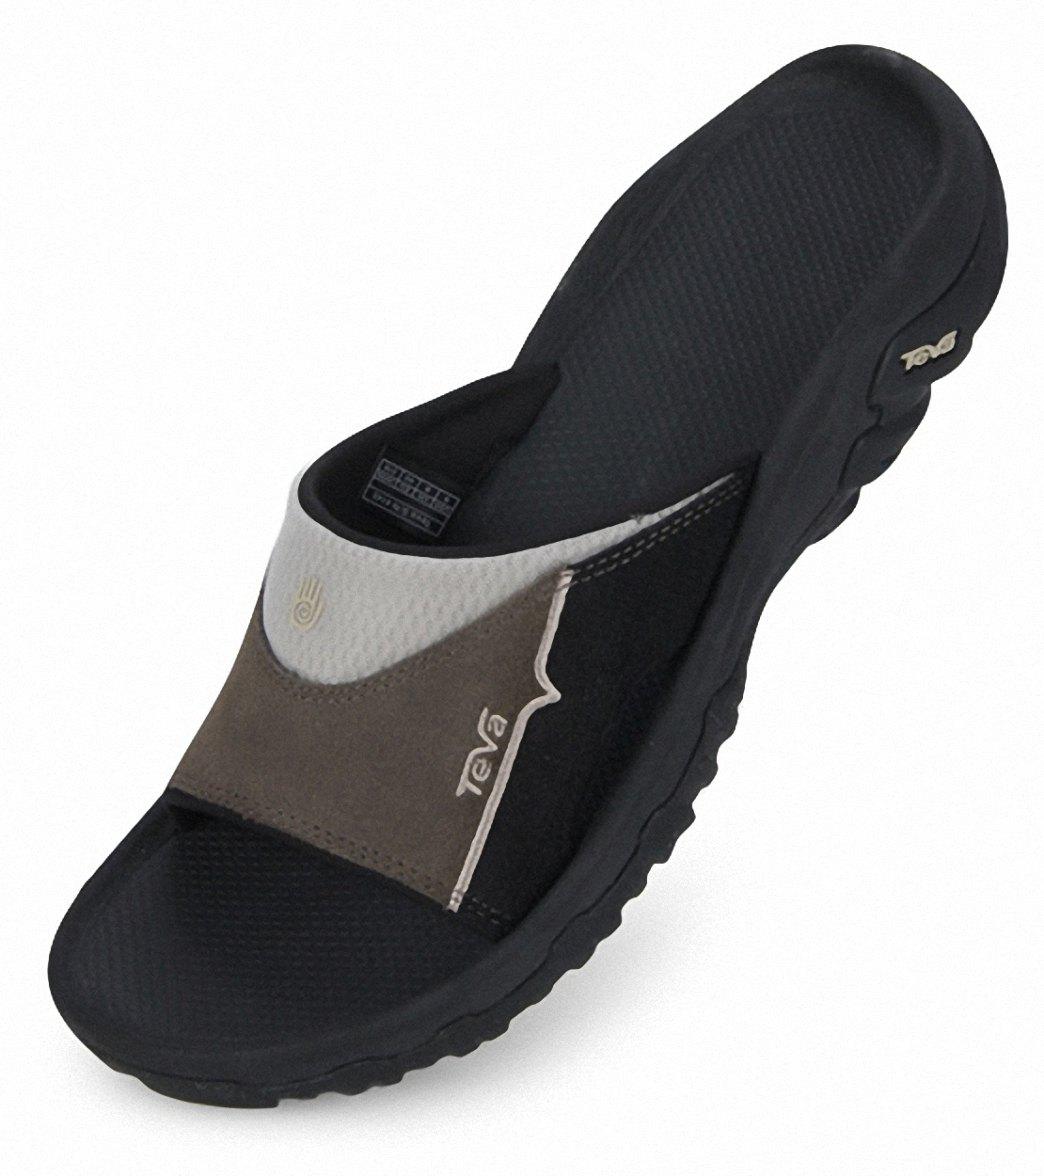 c2fd3e32553d4 Teva Men s Katavi Slide Sandals at SwimOutlet.com - Free Shipping